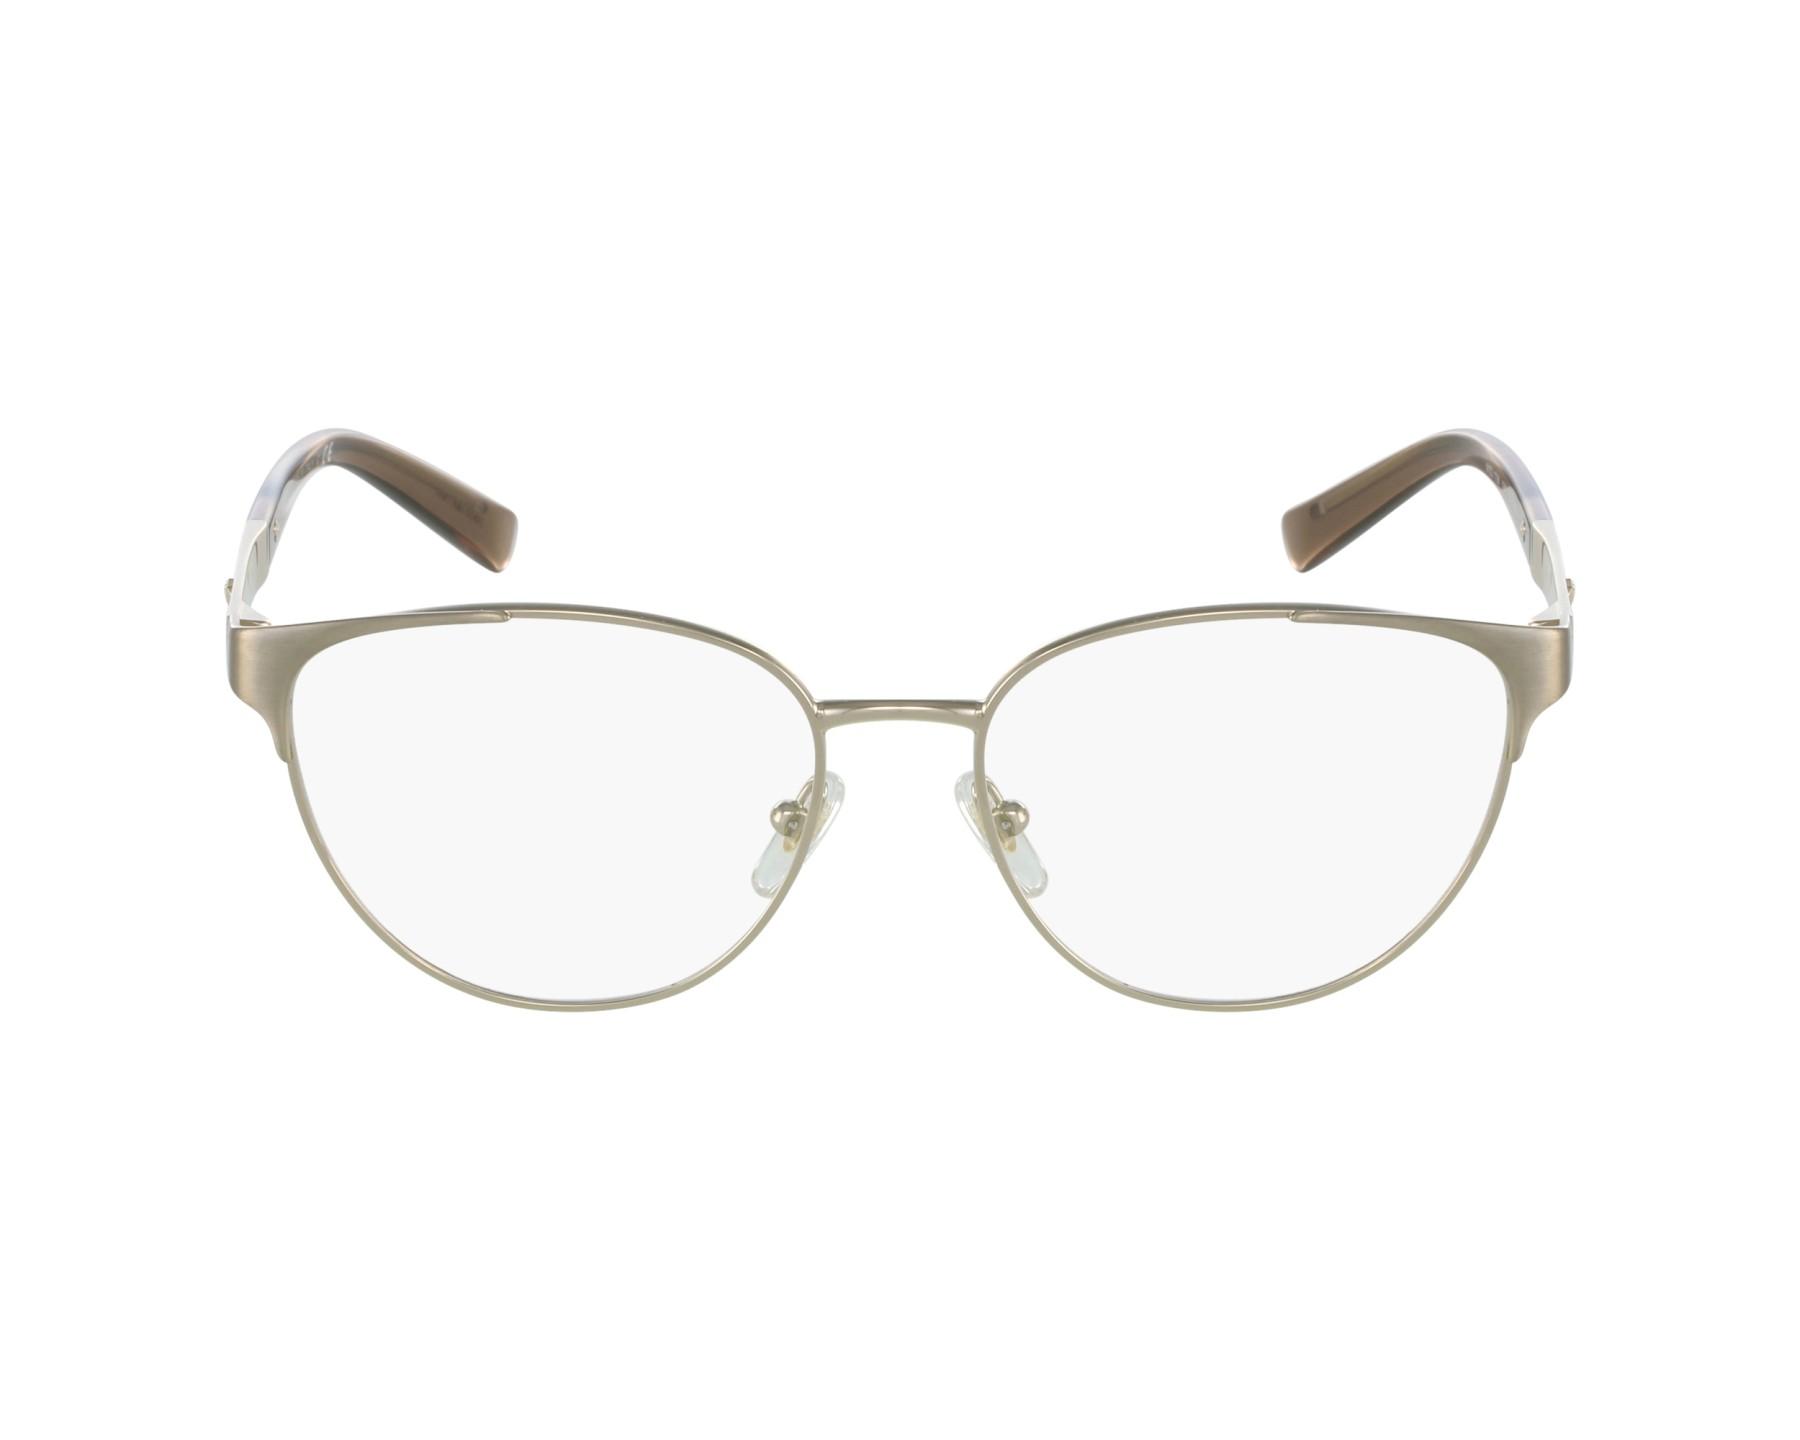 eyeglasses Versace VE-1238 1339 52-16 Gold profile view